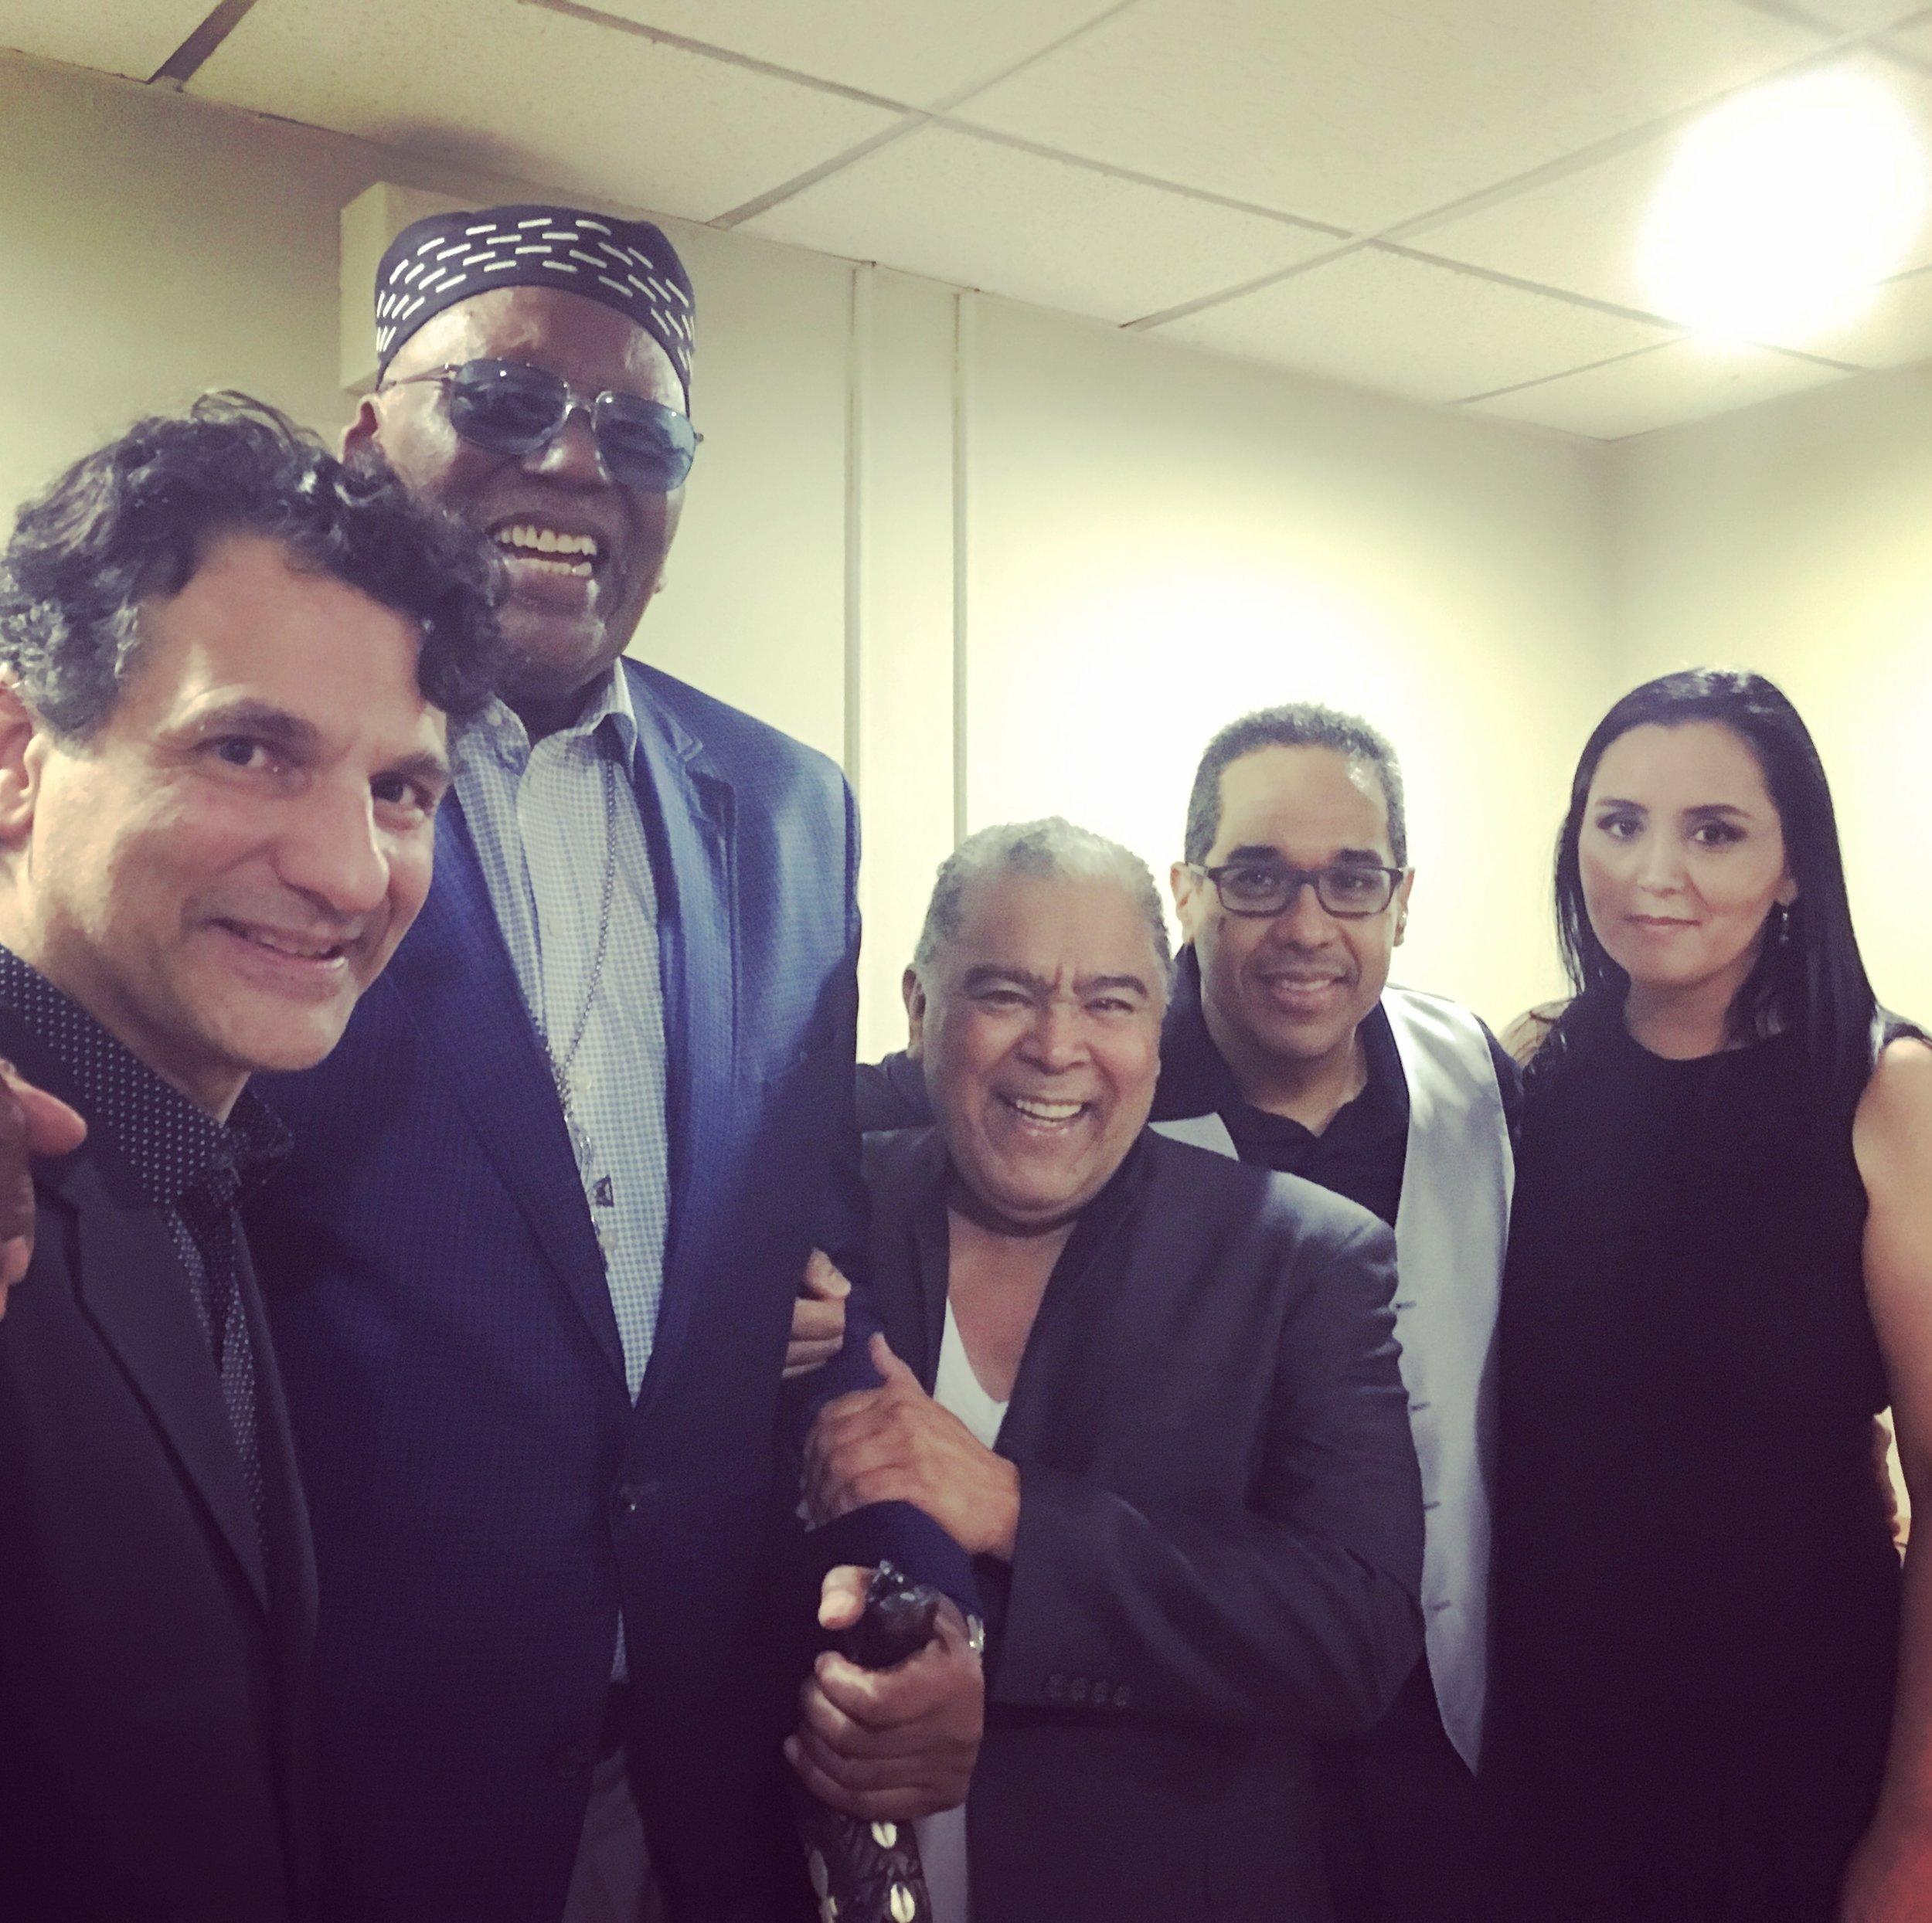 (After the gala show - John Patitucci, Randy Weston, Danny Rivera, Danilo Pérez, Patricia Zárate - January 2016)